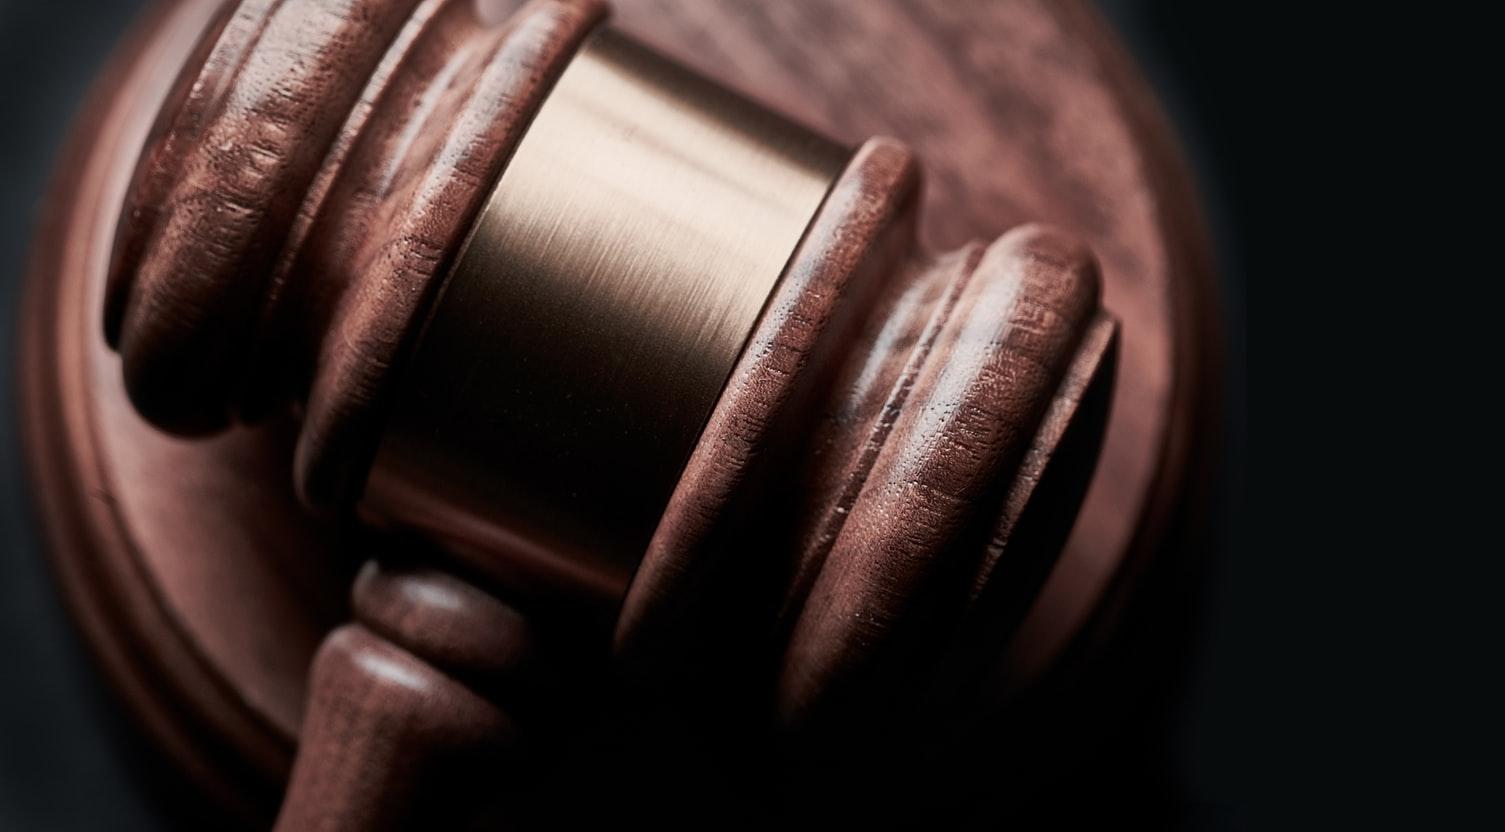 Lawyer's gavel